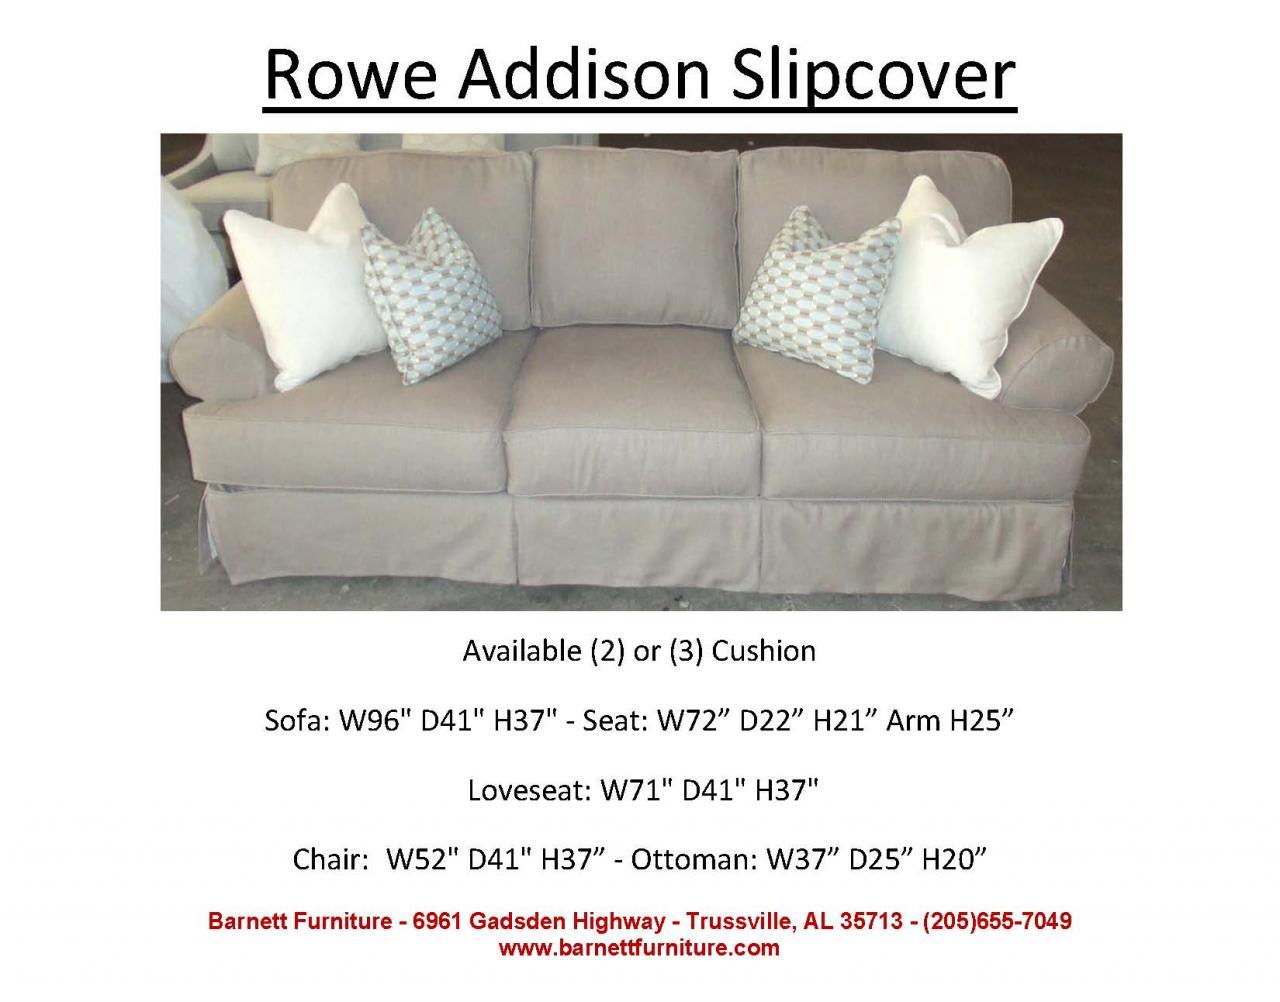 ... Rowe Addison Slipcover Sofa ...